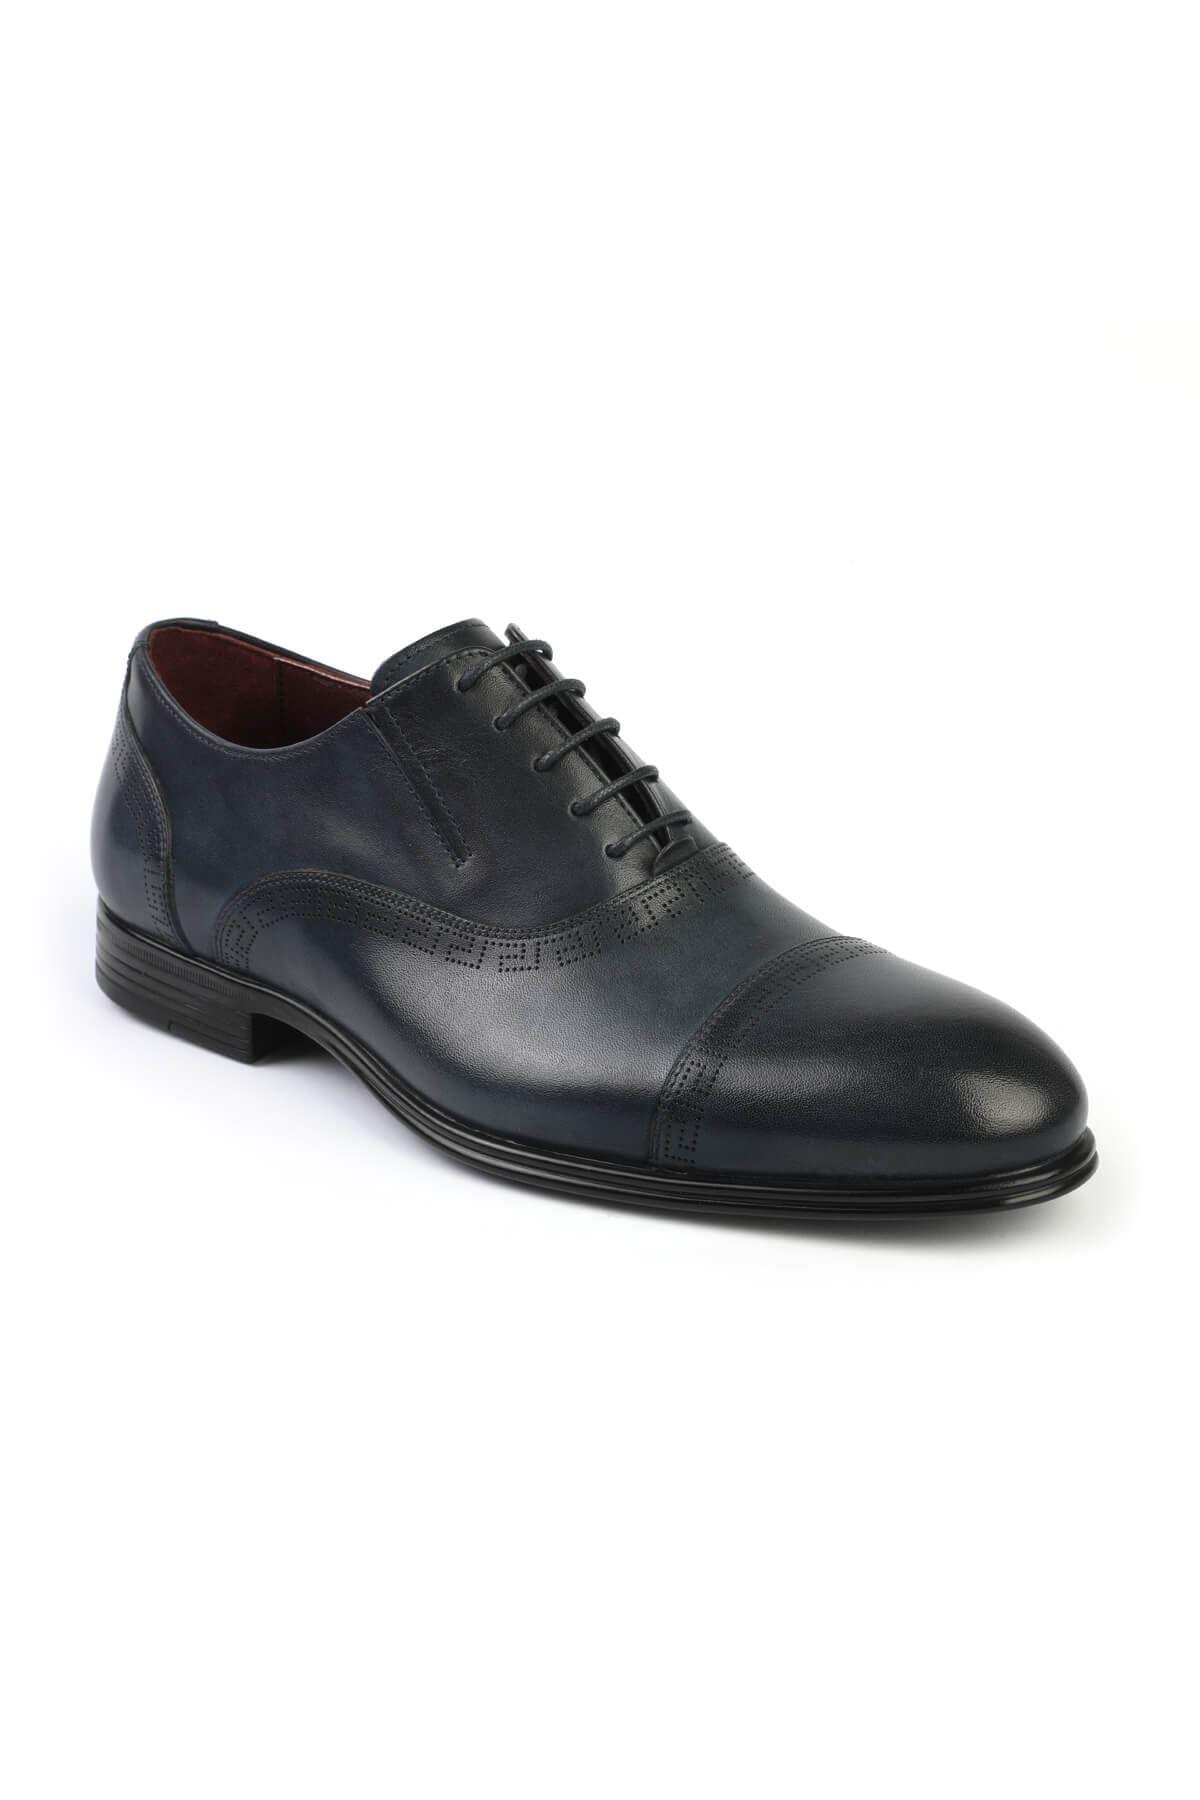 Libero 3113 Navy Blue Classic Shoes